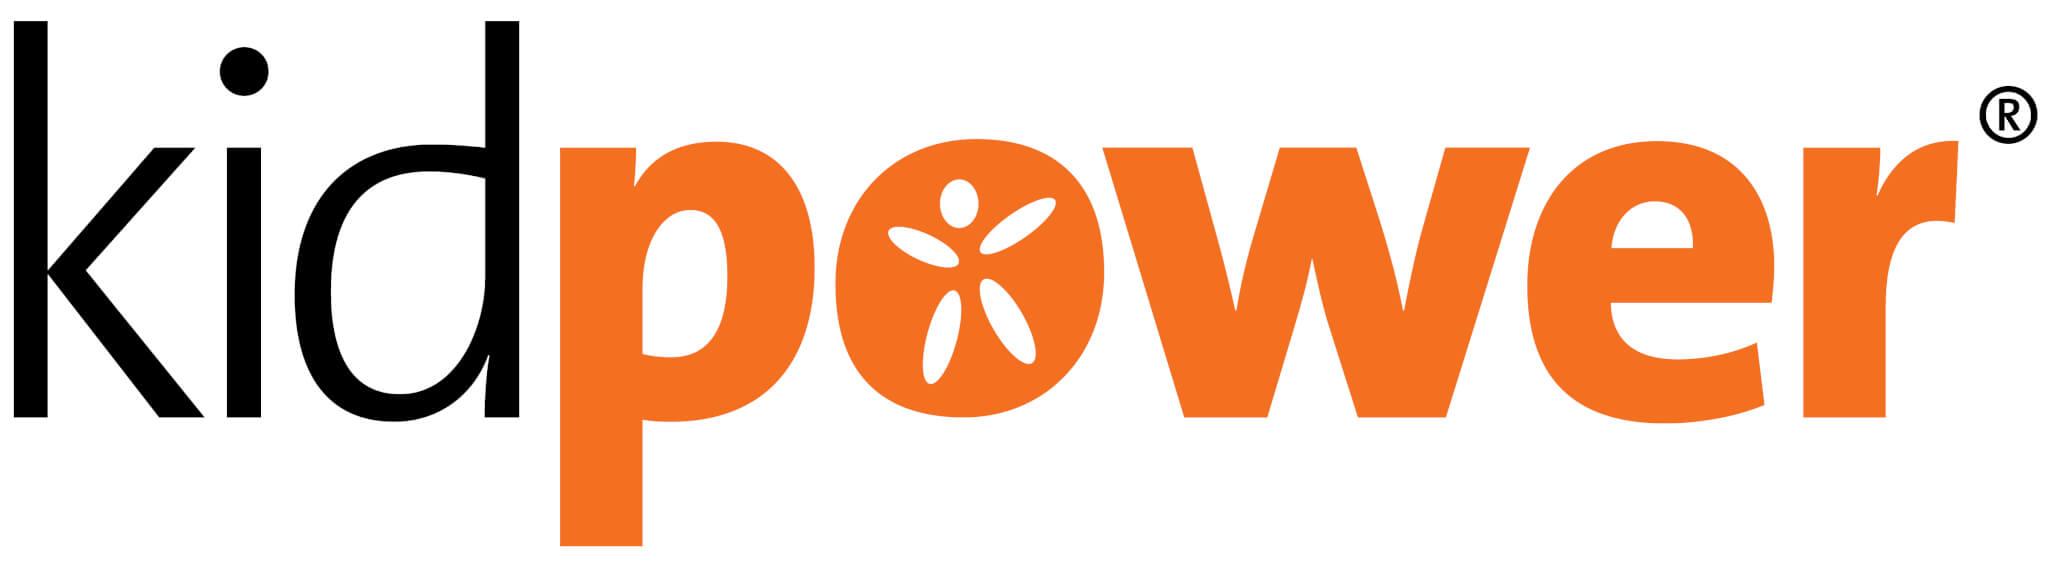 Kidpower Logo